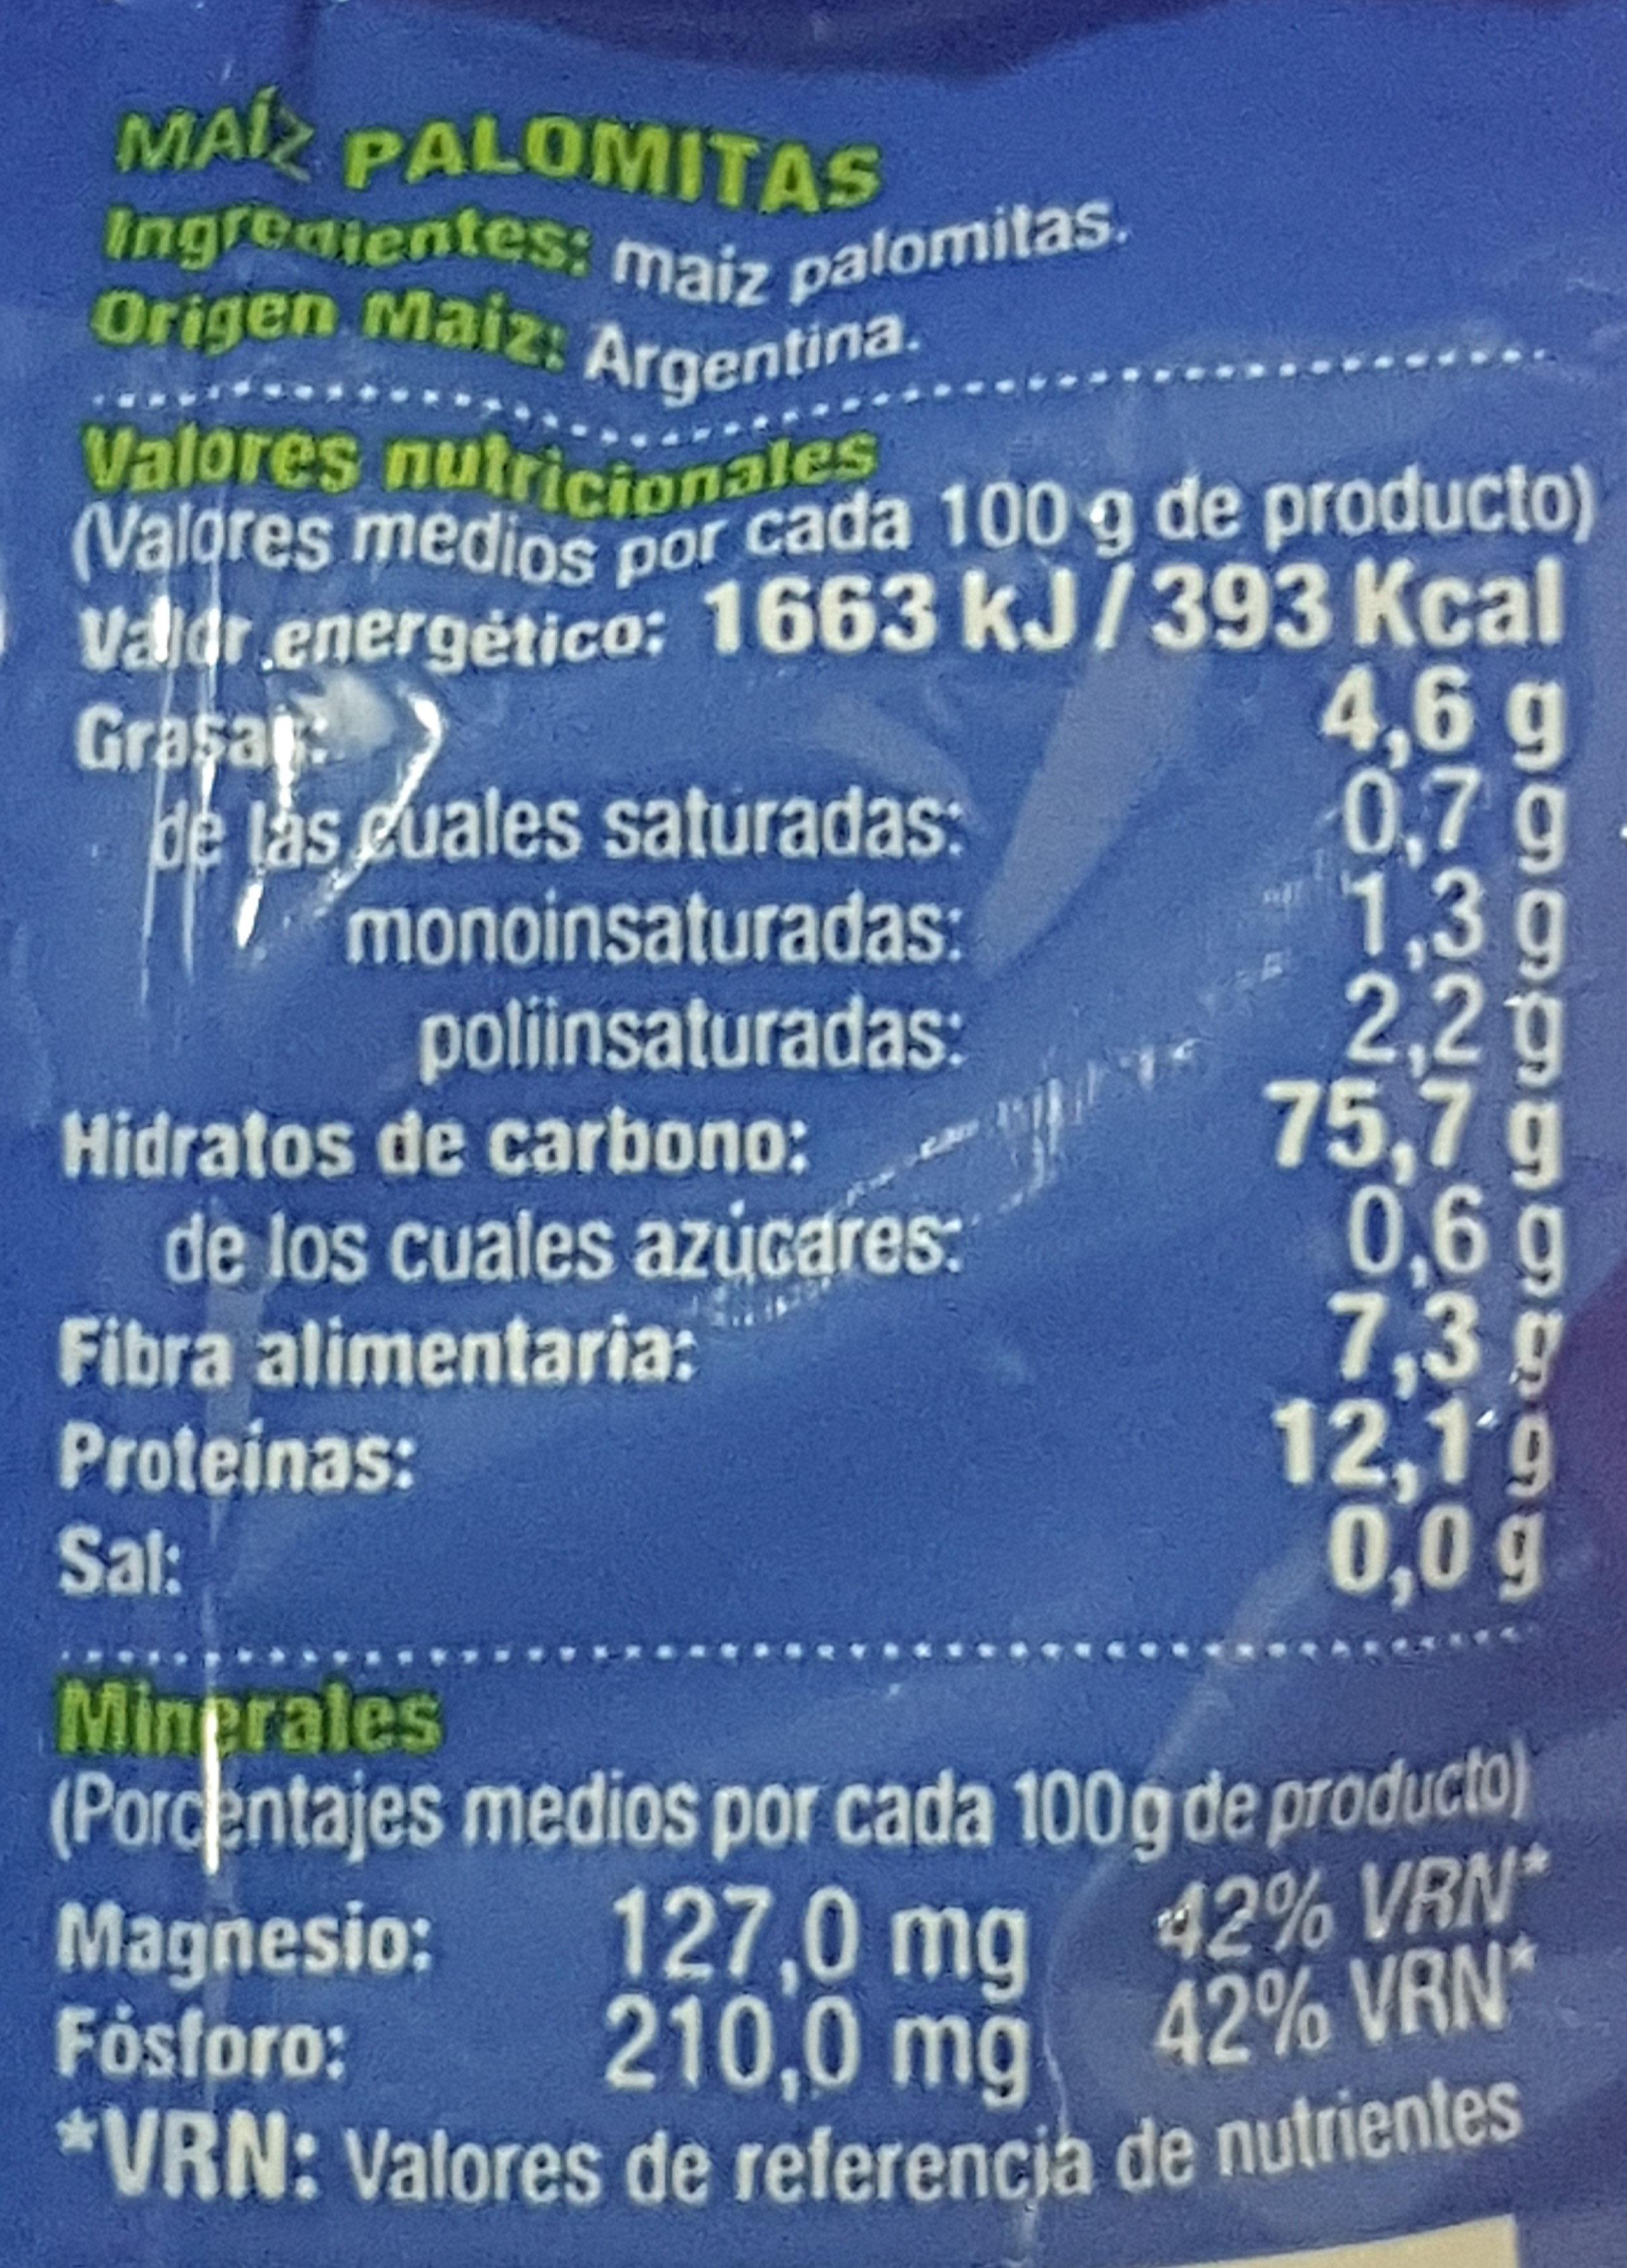 Maíz palomitas - Información nutricional